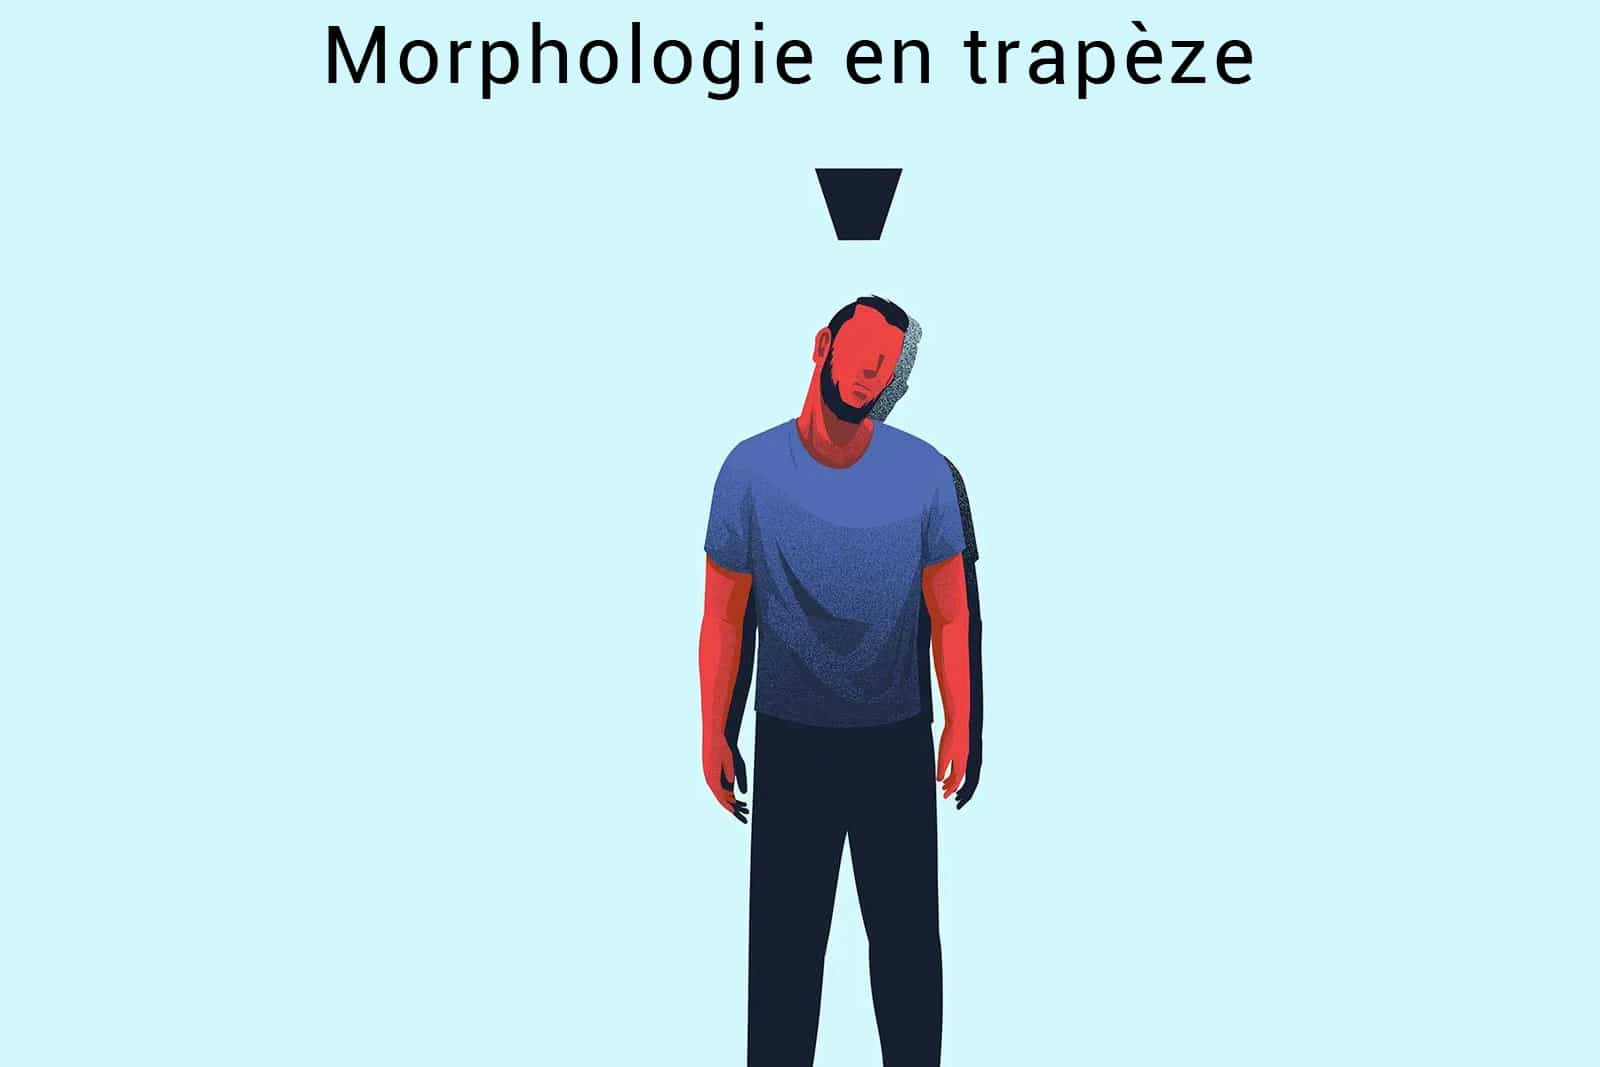 morphologie en trapèze homme